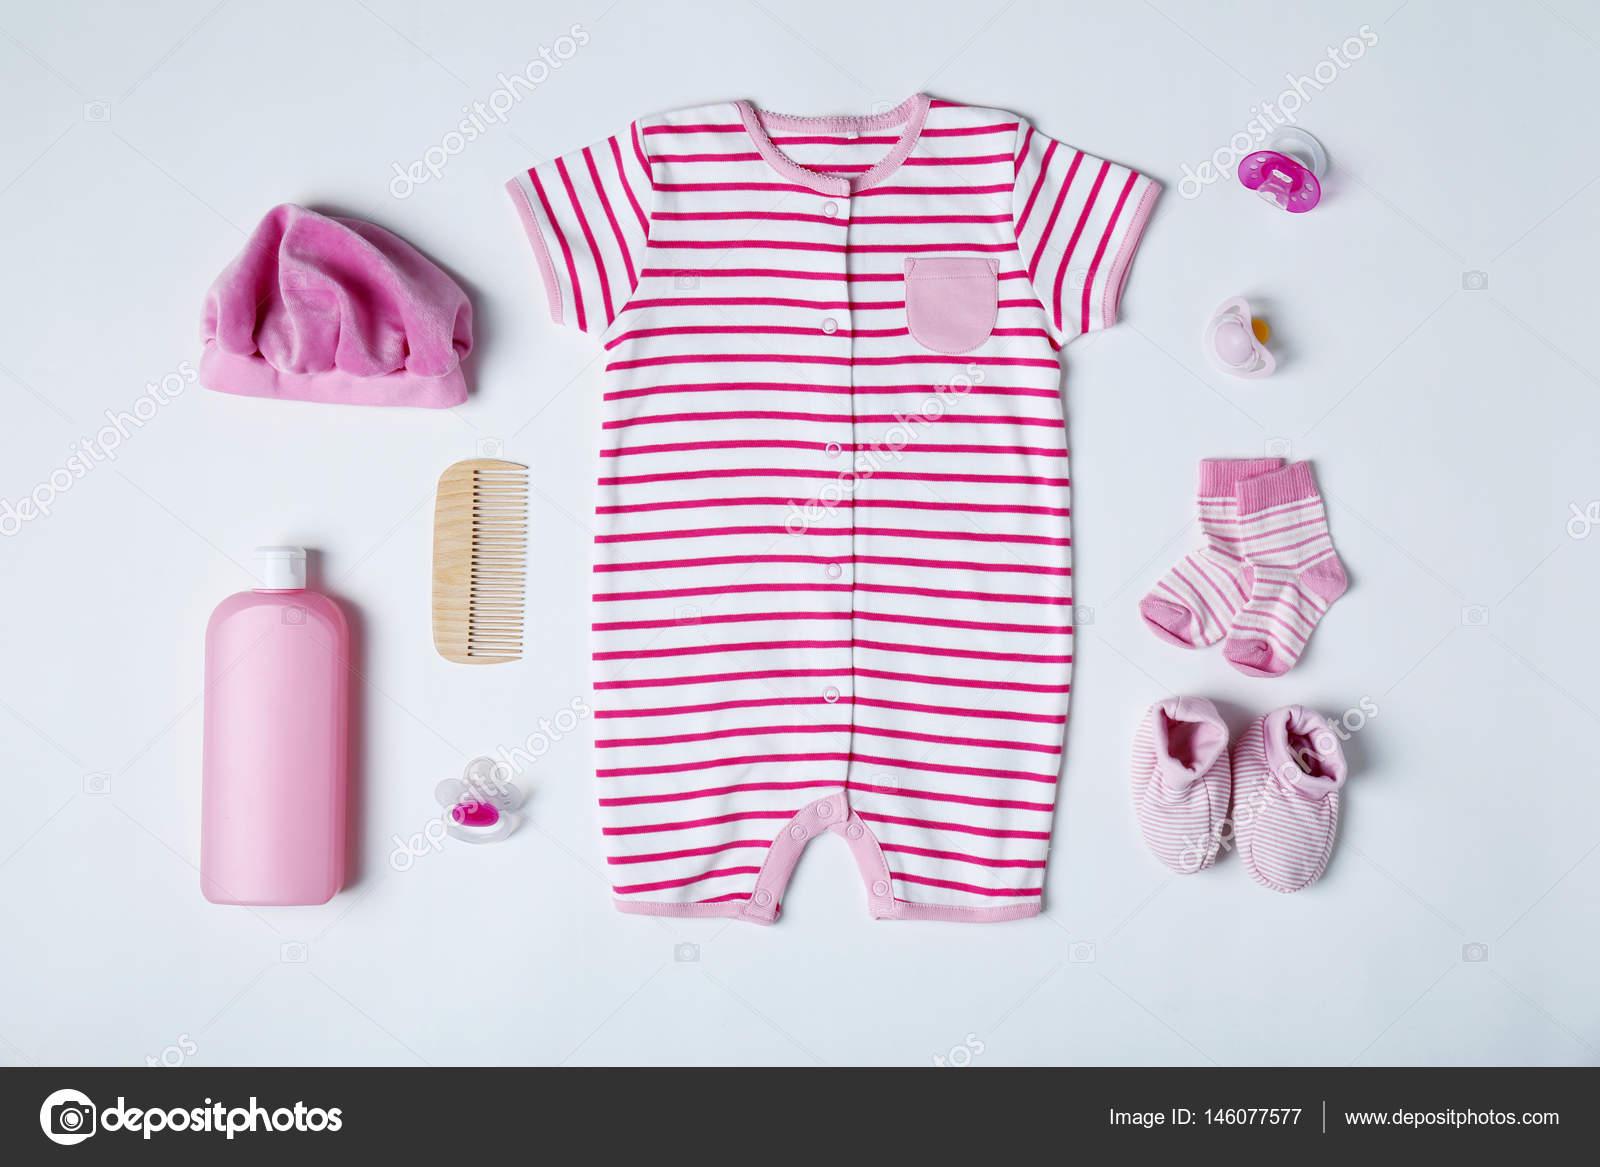 9a58edabd6d Παιδικά ρούχα και αξεσουάρ — Φωτογραφία Αρχείου © belchonock #146077577